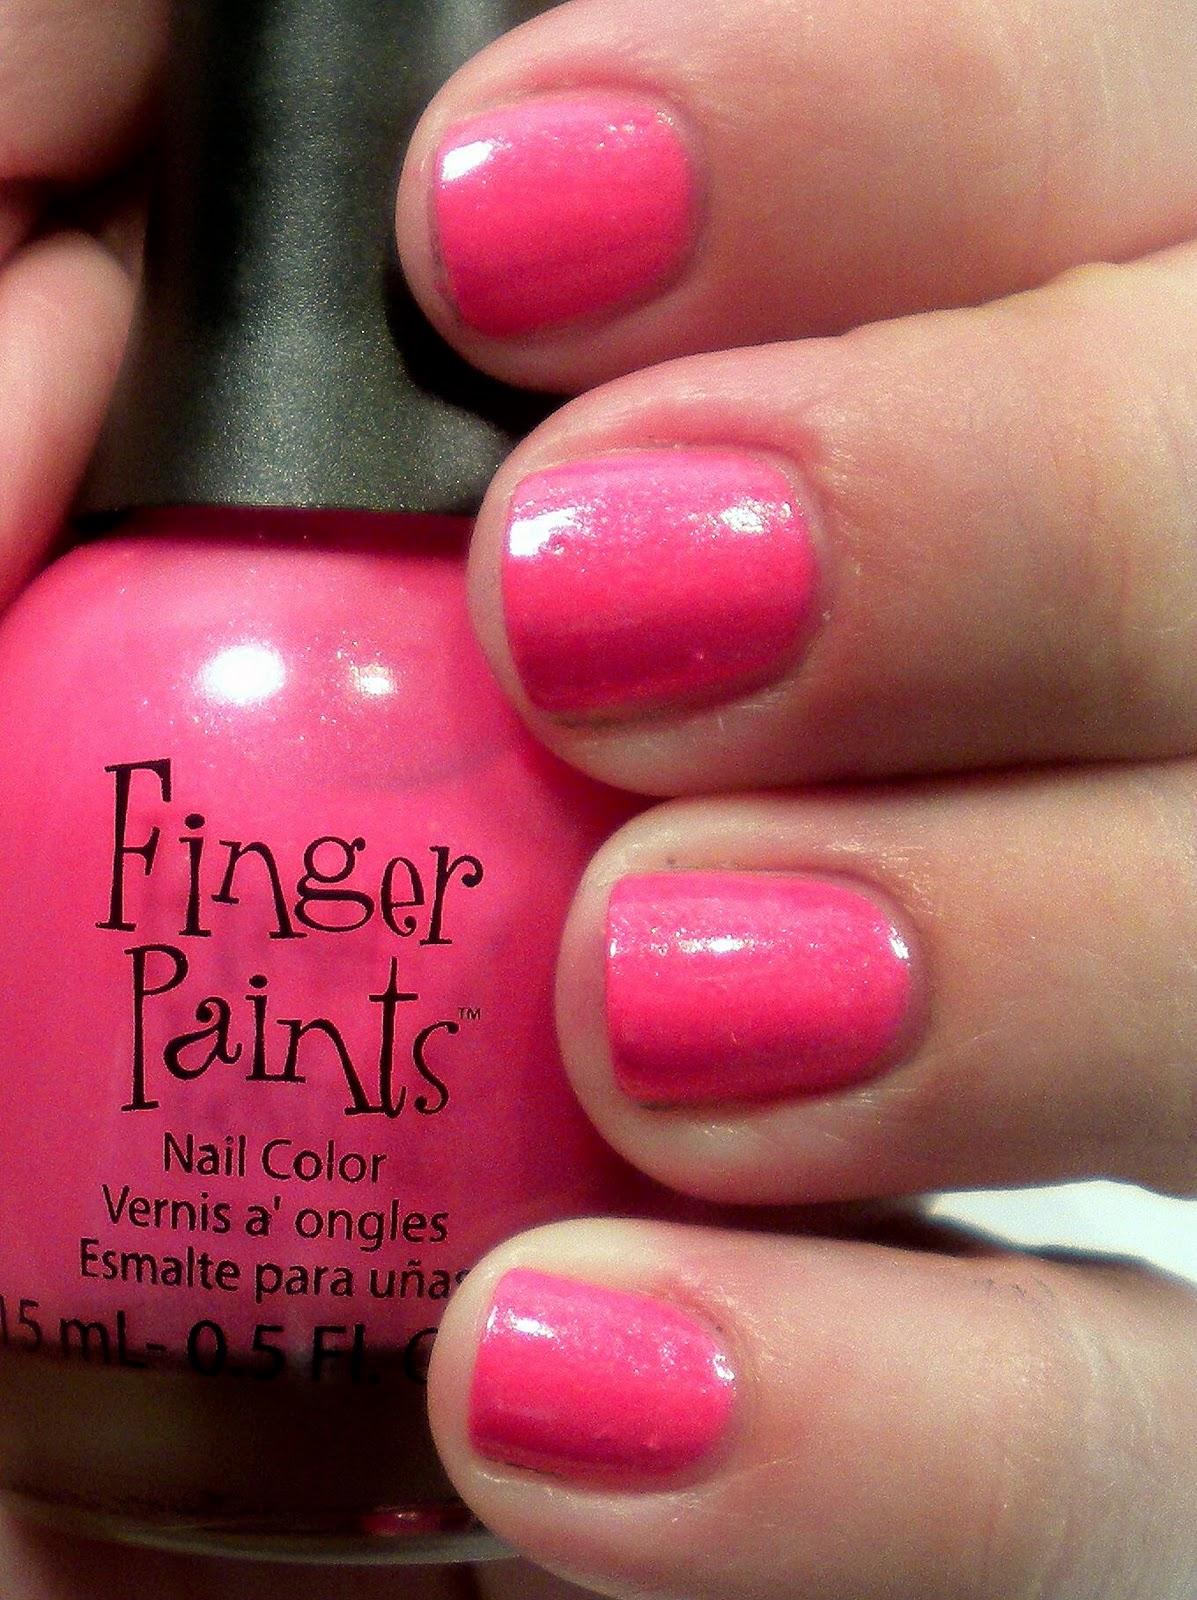 Nail Polish Addiction Anonymous: Finger Paints BCA Nail Polish